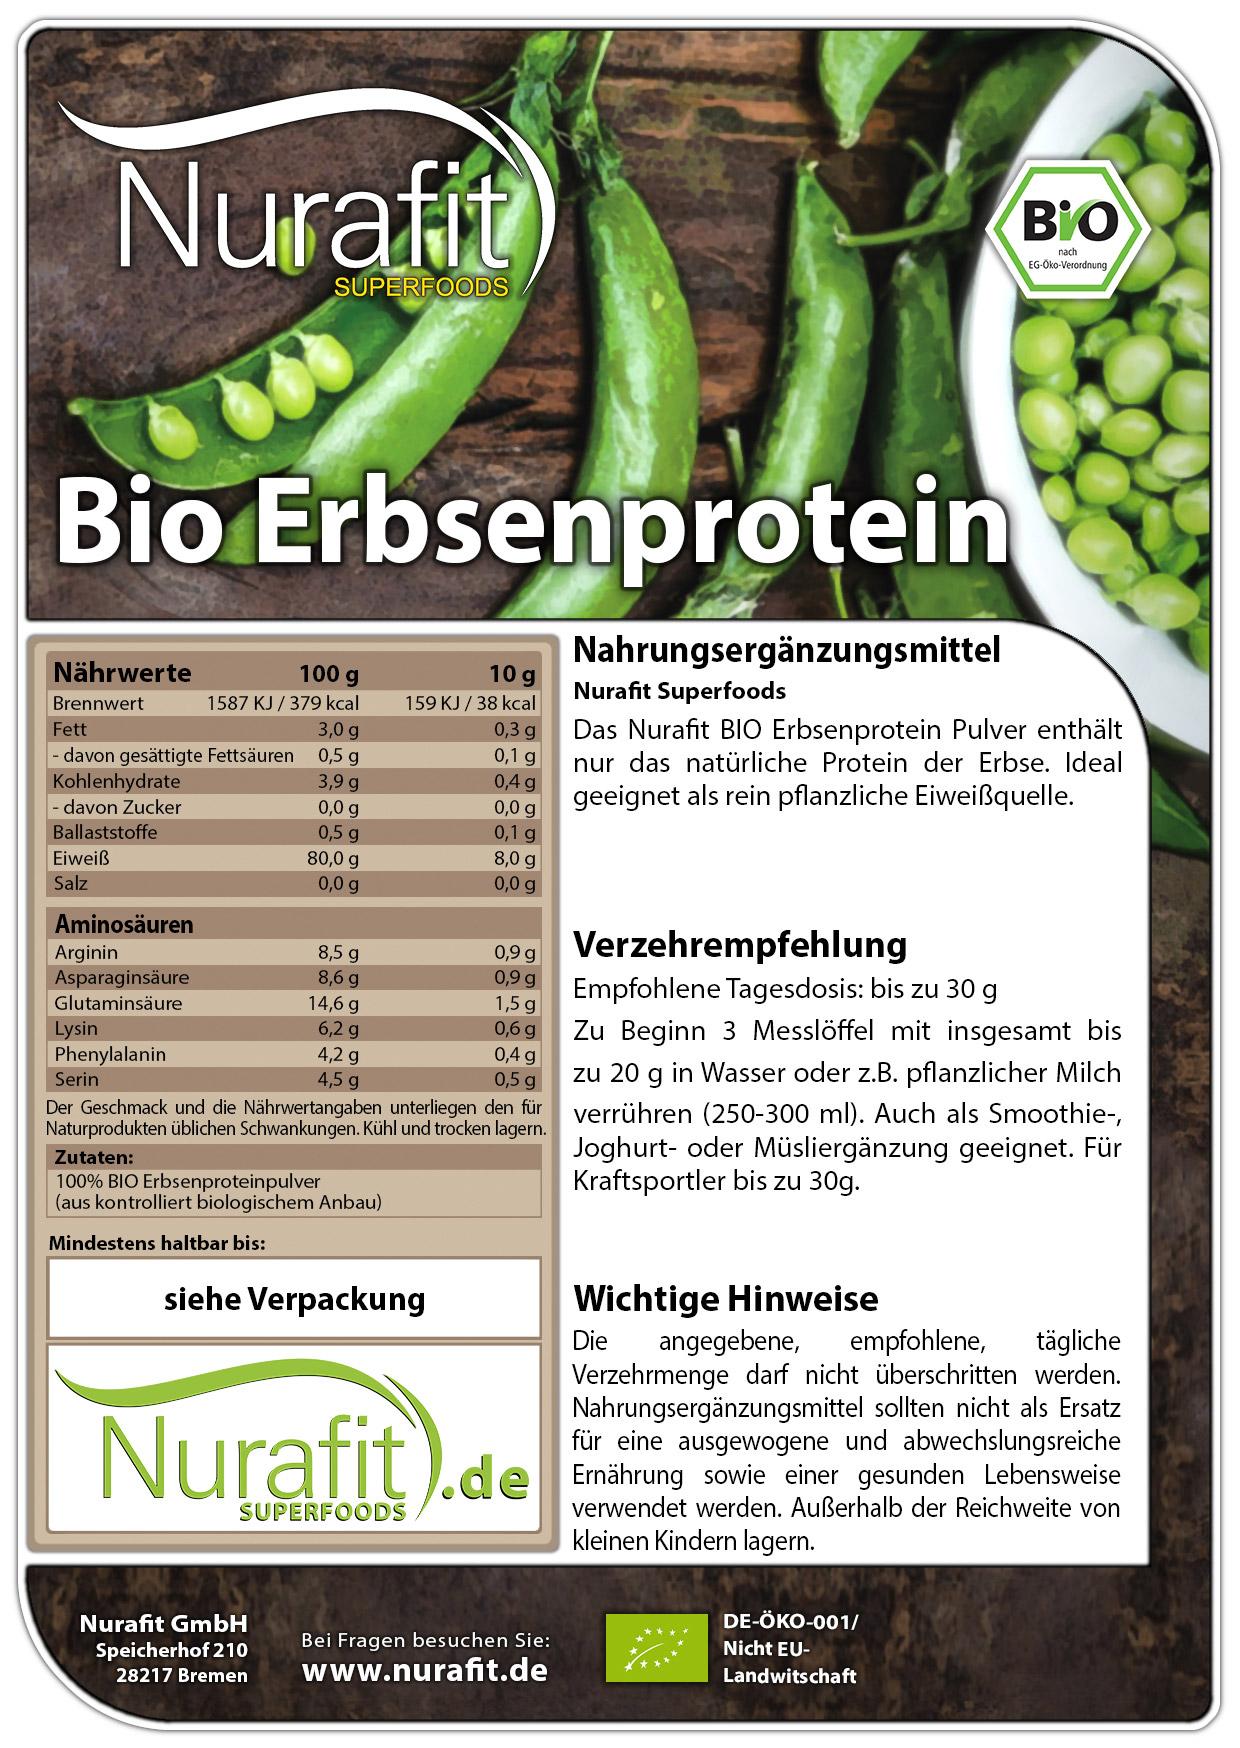 BIO Erbsenprotein